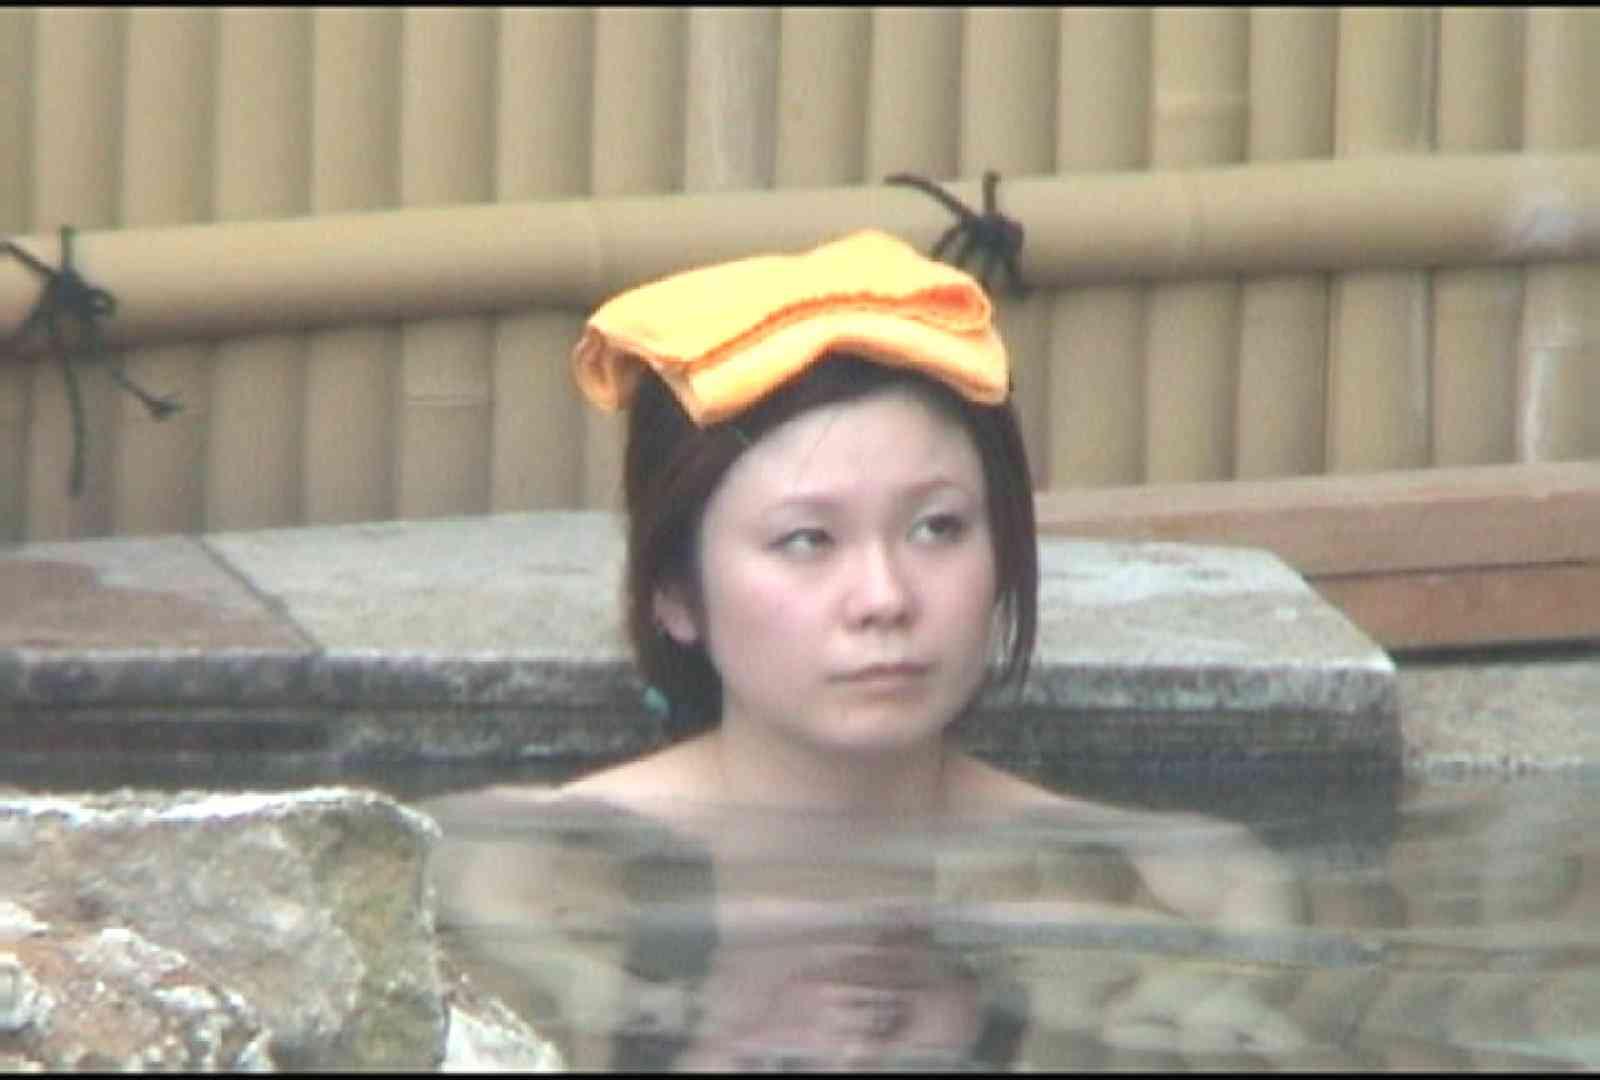 Aquaな露天風呂Vol.177 綺麗なOLたち アダルト動画キャプチャ 112枚 86